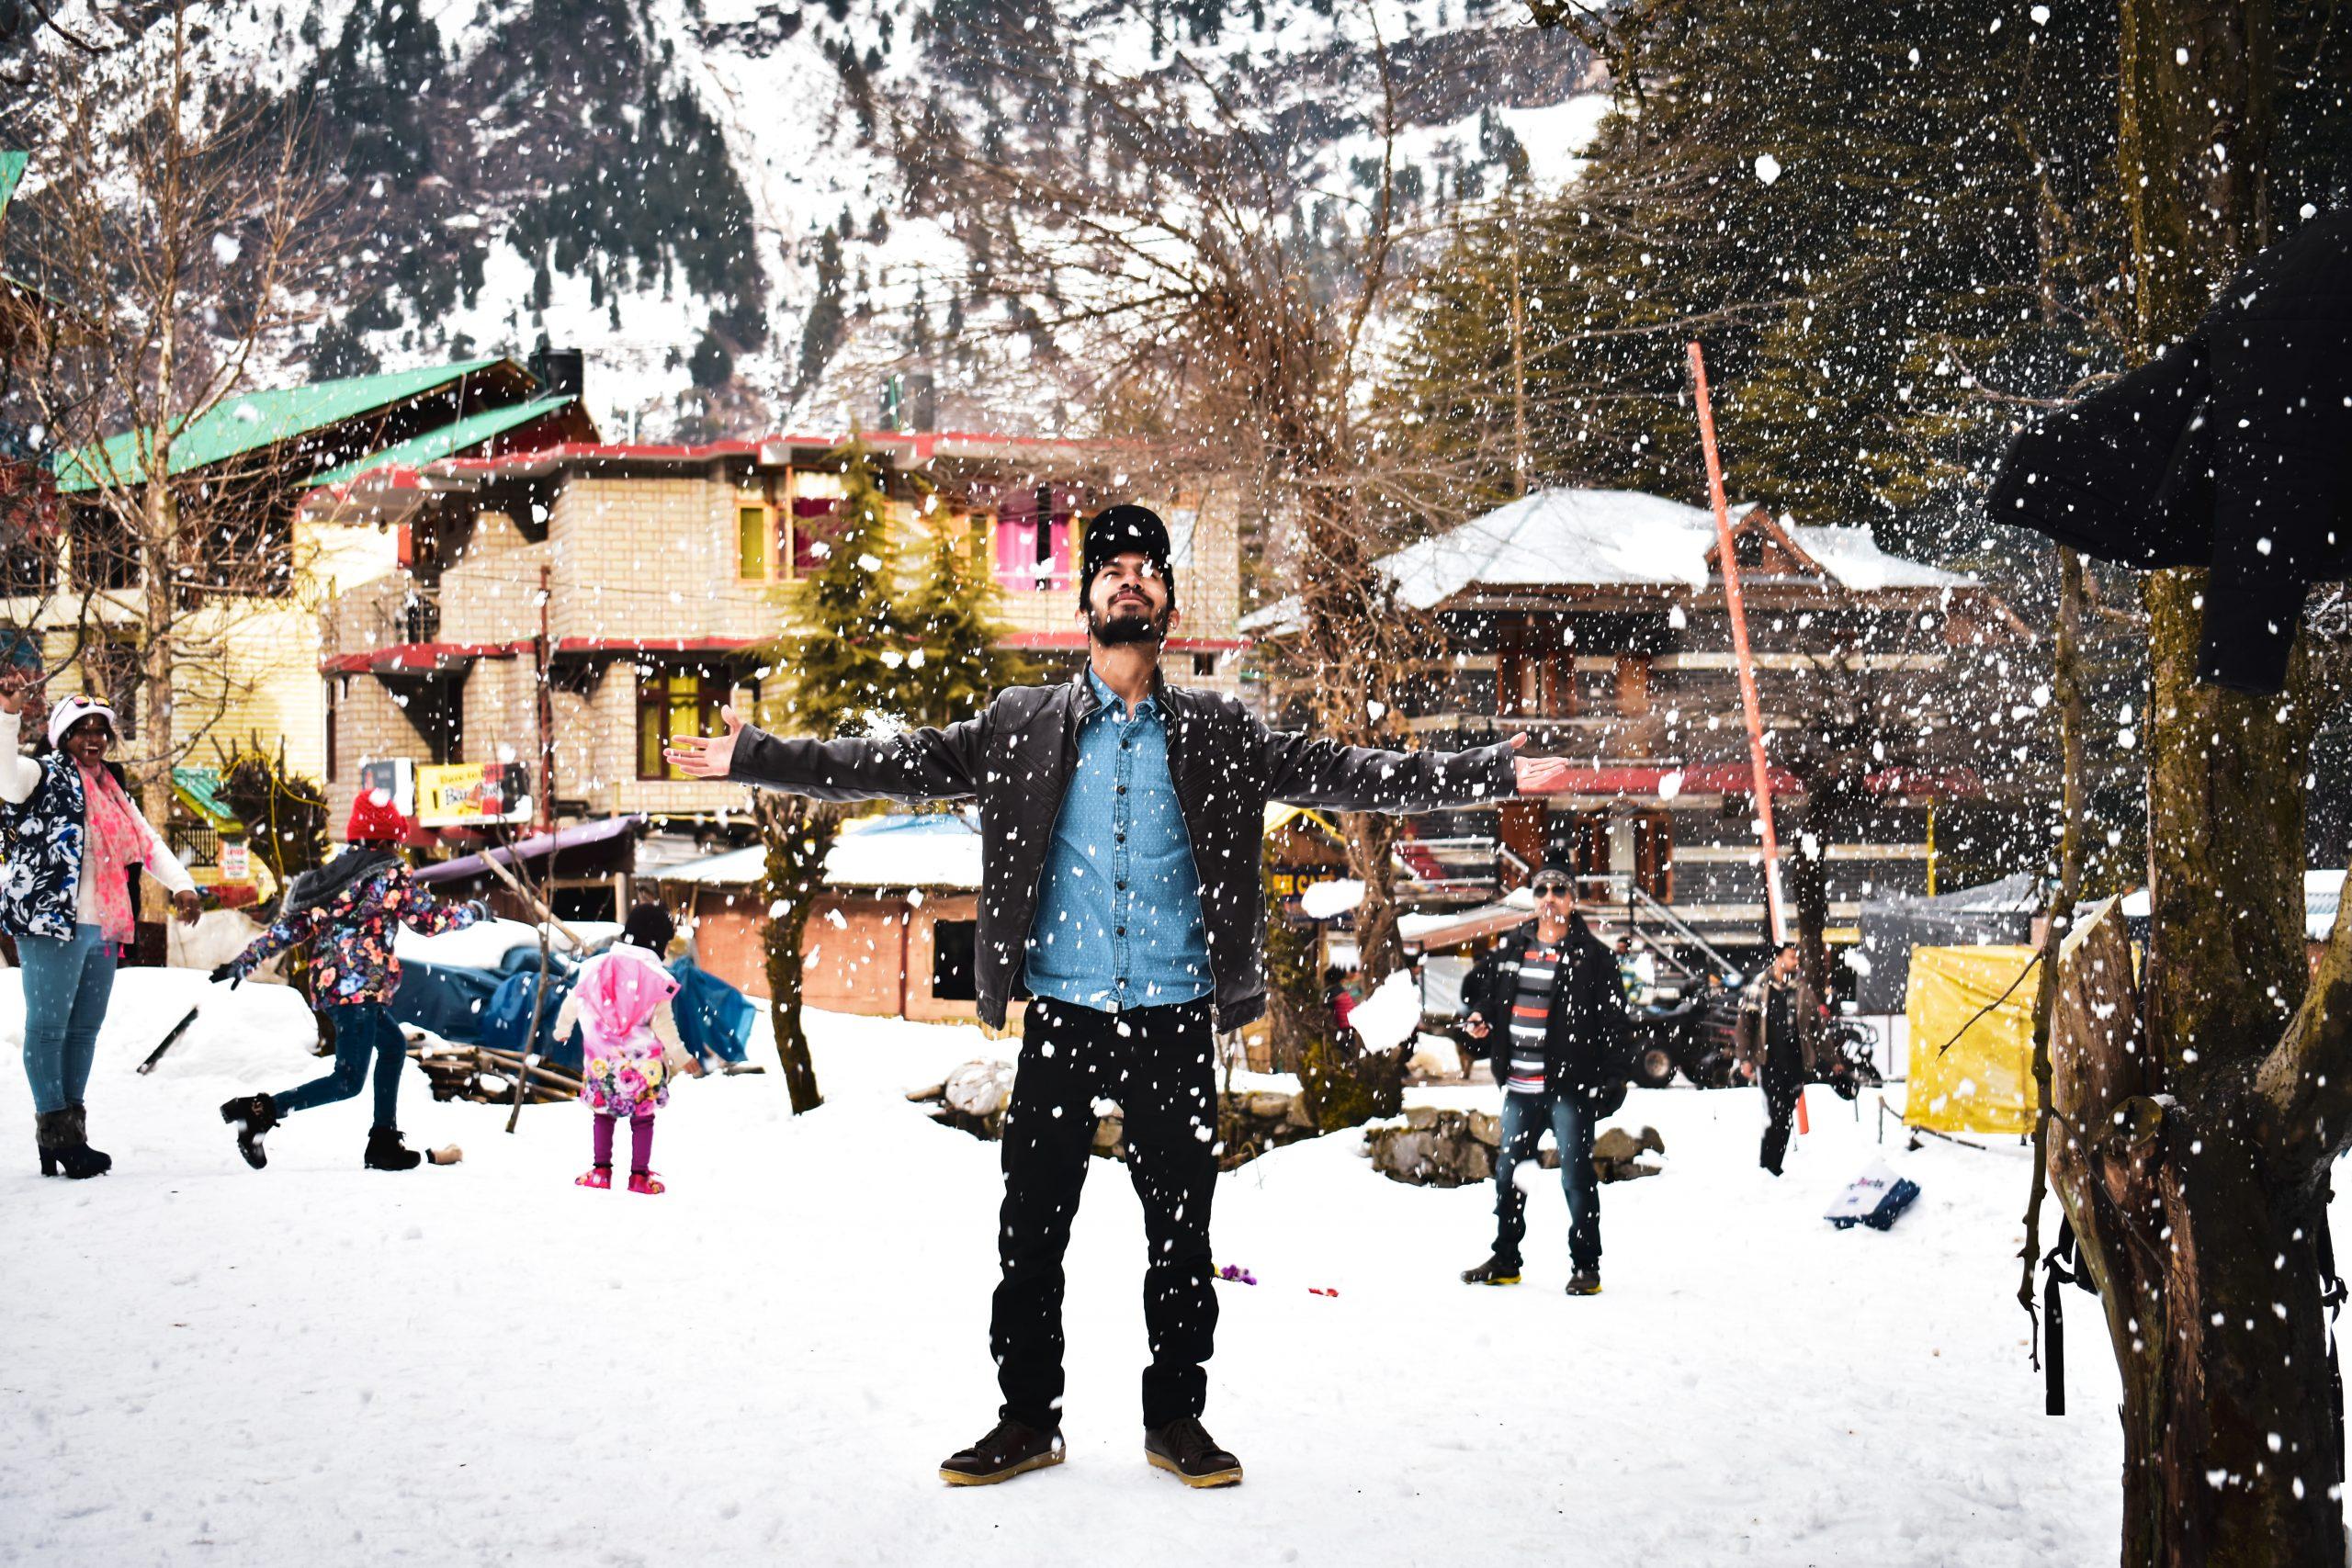 Tourist enjoying snowfall